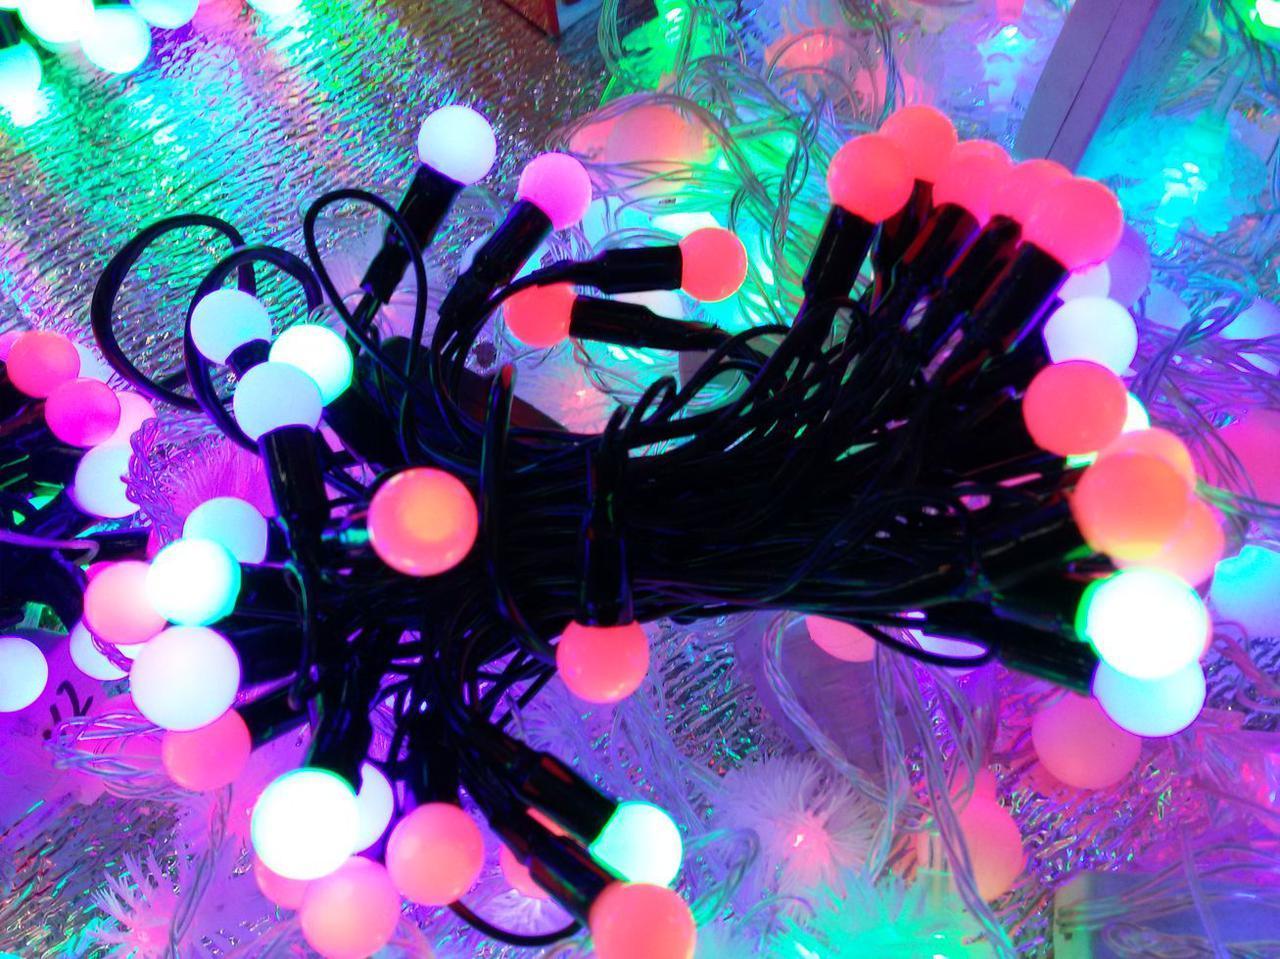 Гирлянда шарики 50 LED 11mm 6 метров разноцветная